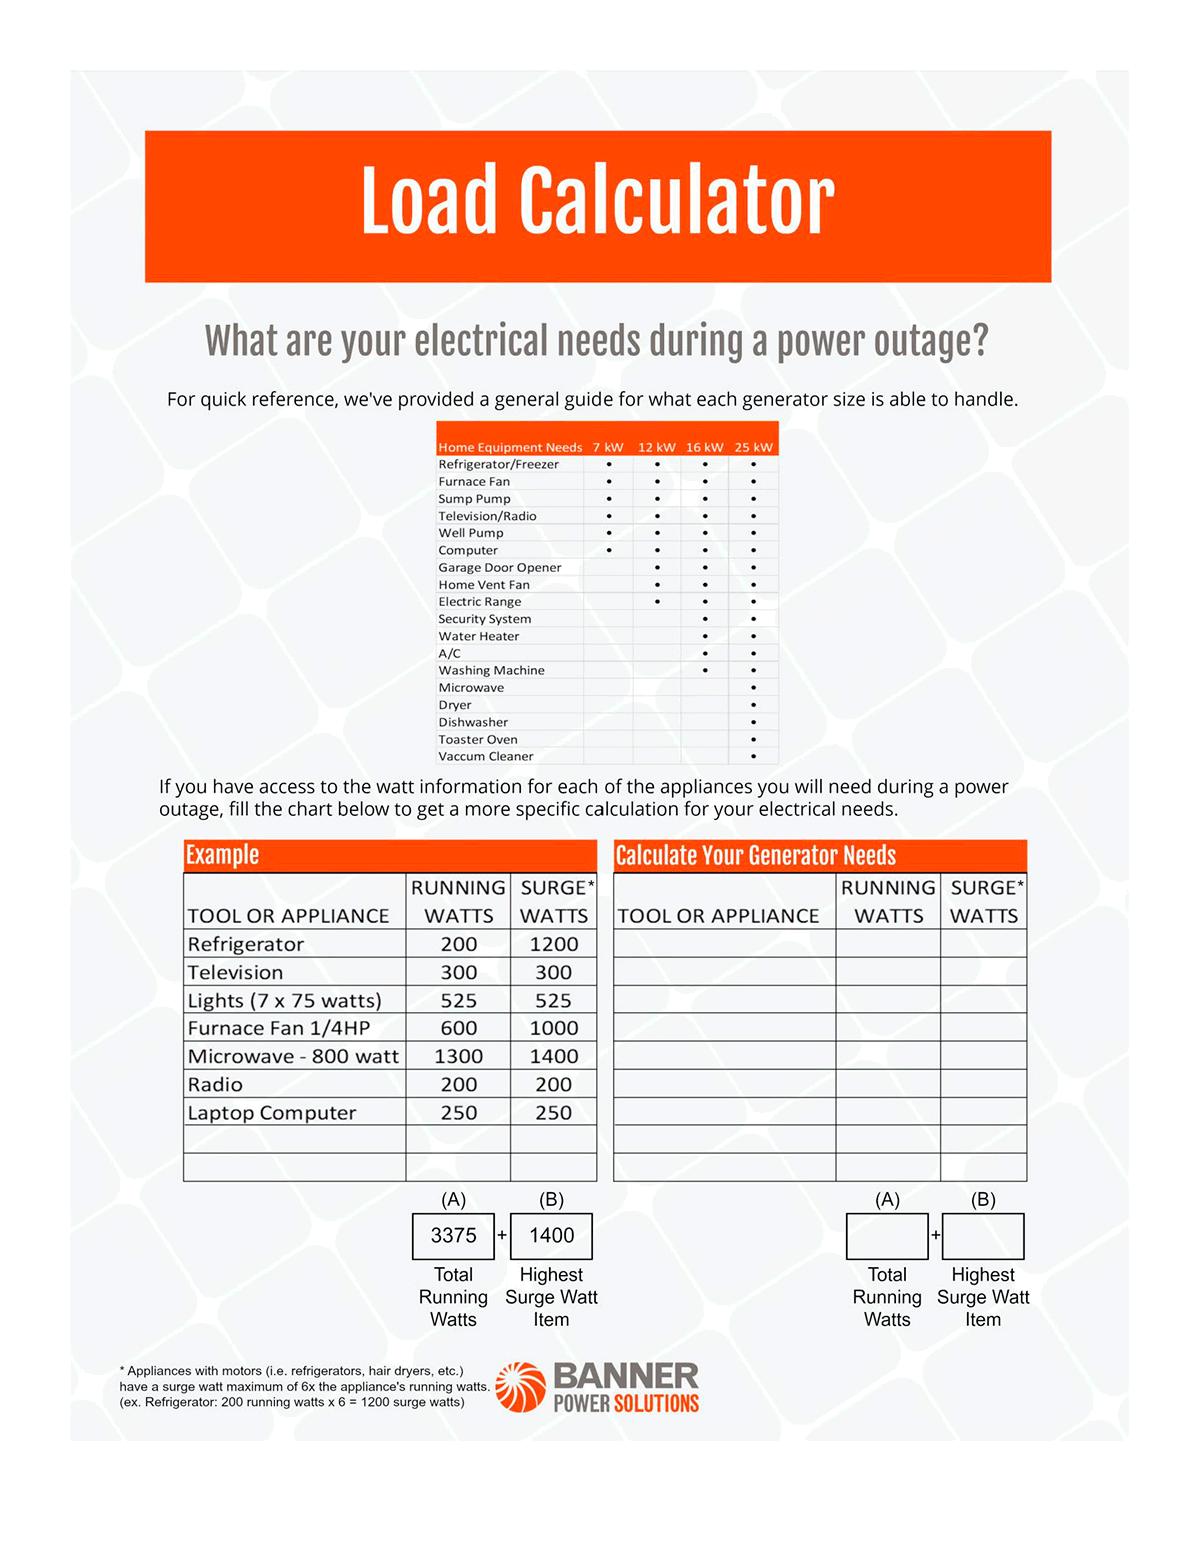 Generators Banner Power Solutions Whatcom Skagit